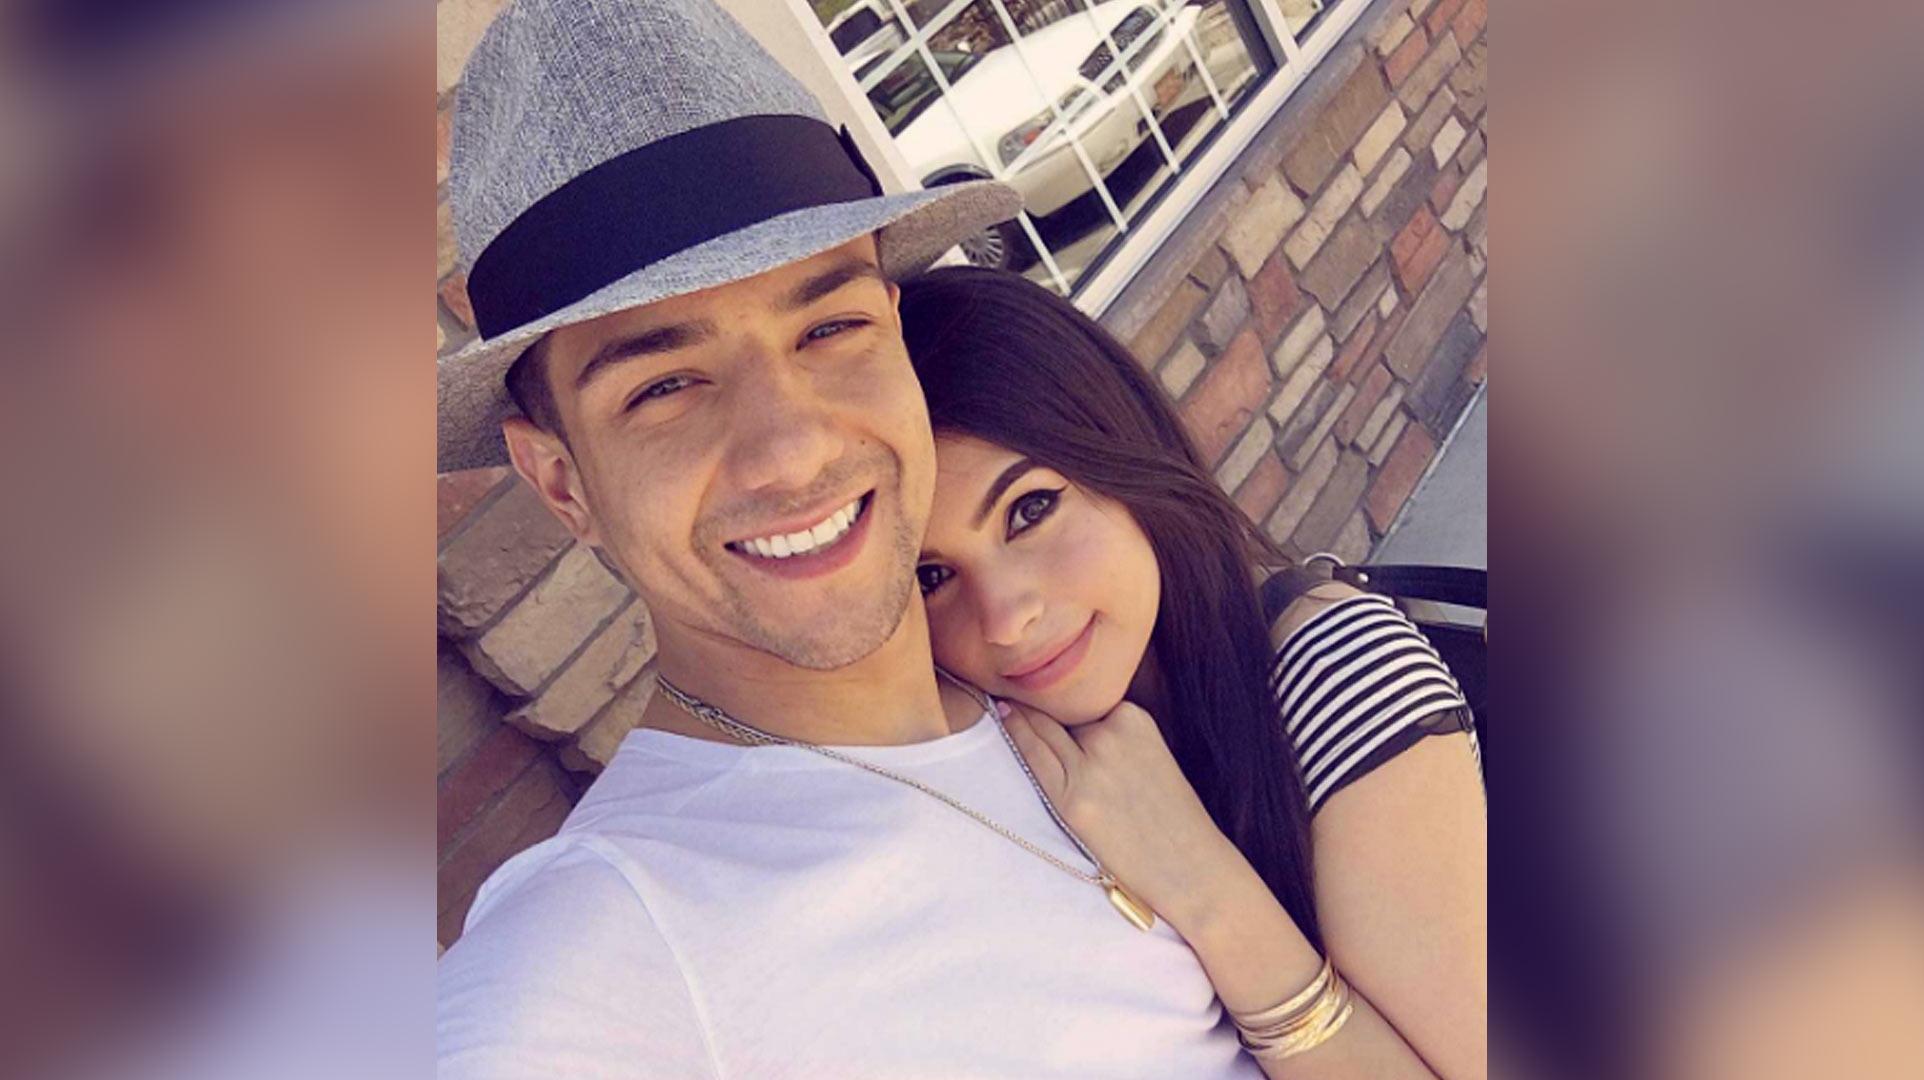 Luis Coronel vuelve con su novia | Telemundo